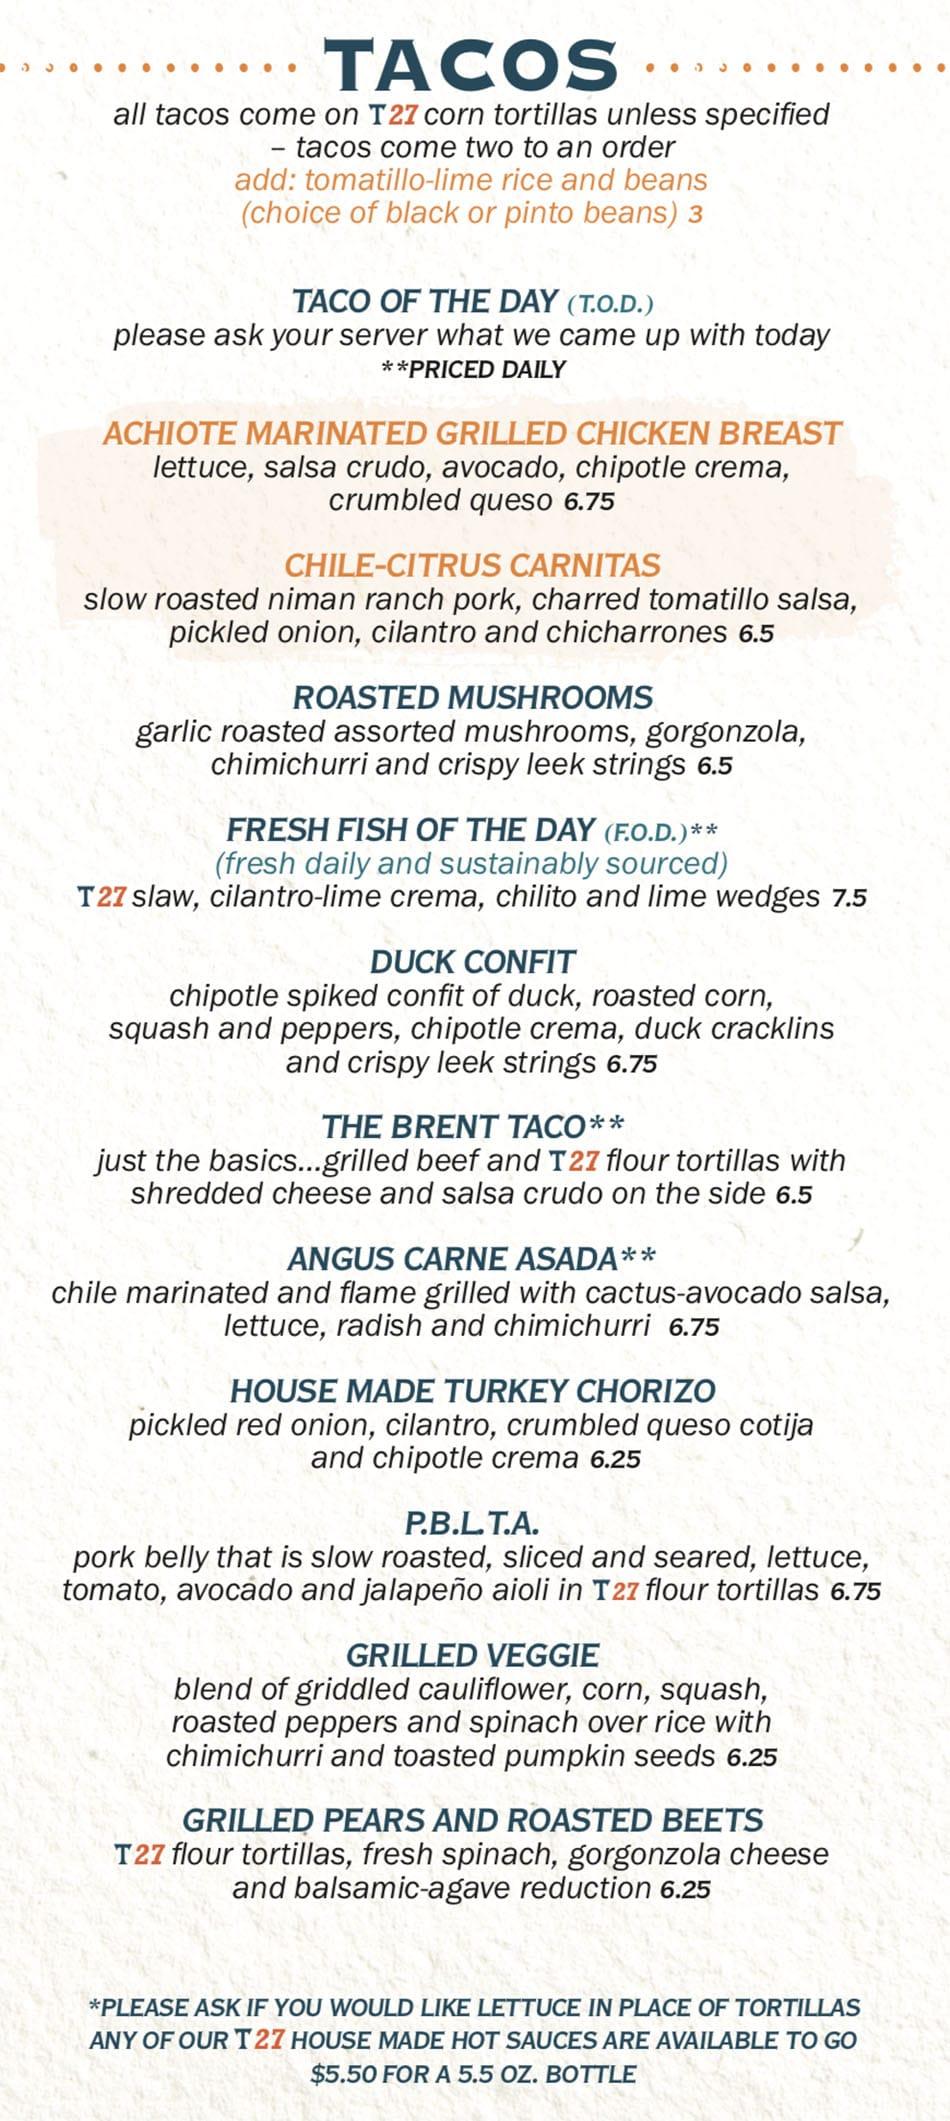 Taqueria 27 menu - tacos